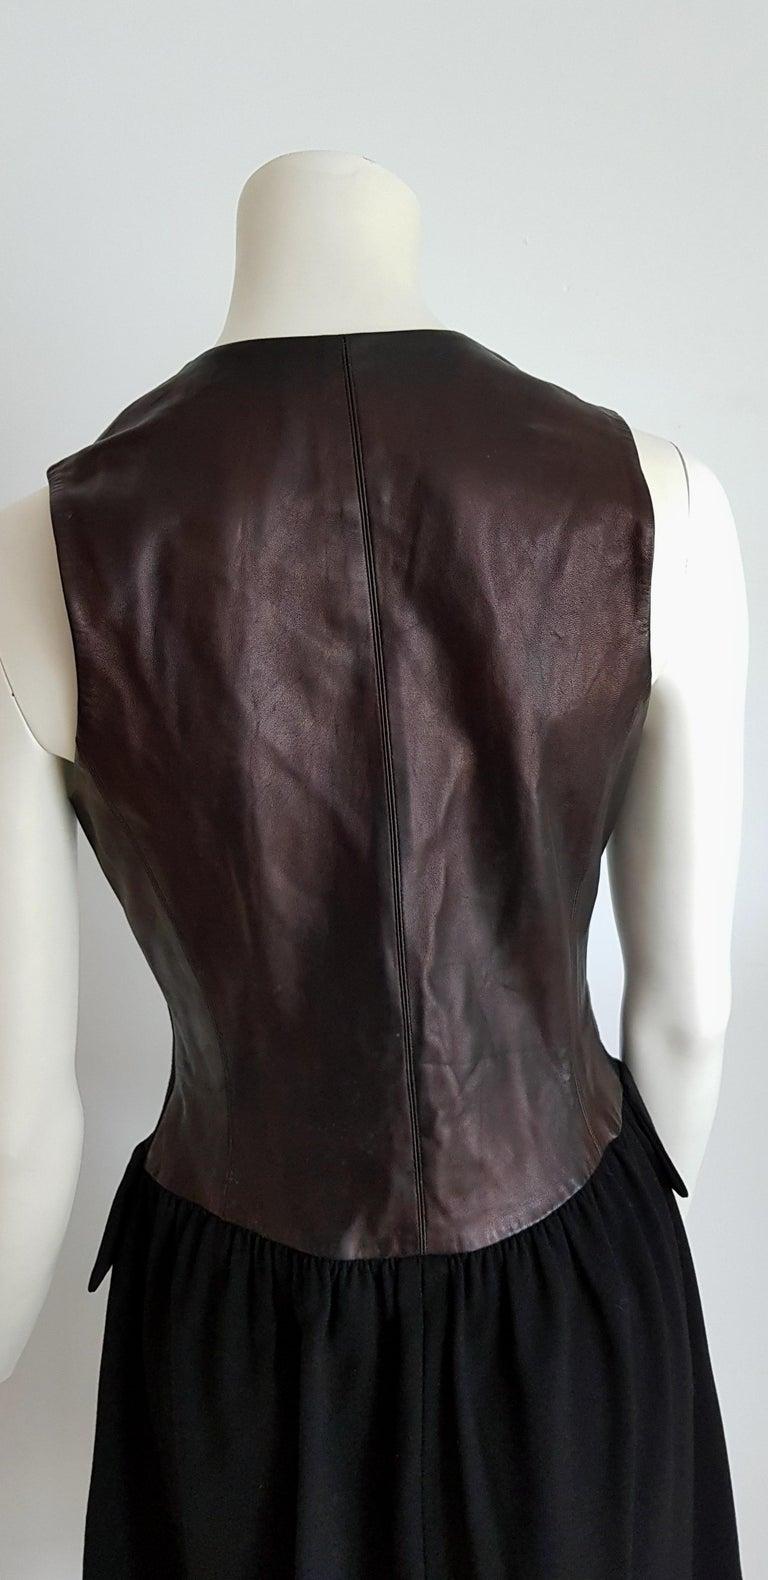 HERMES  Black Wool Leather Light Bronze Tone Lambskin Dress  For Sale 1